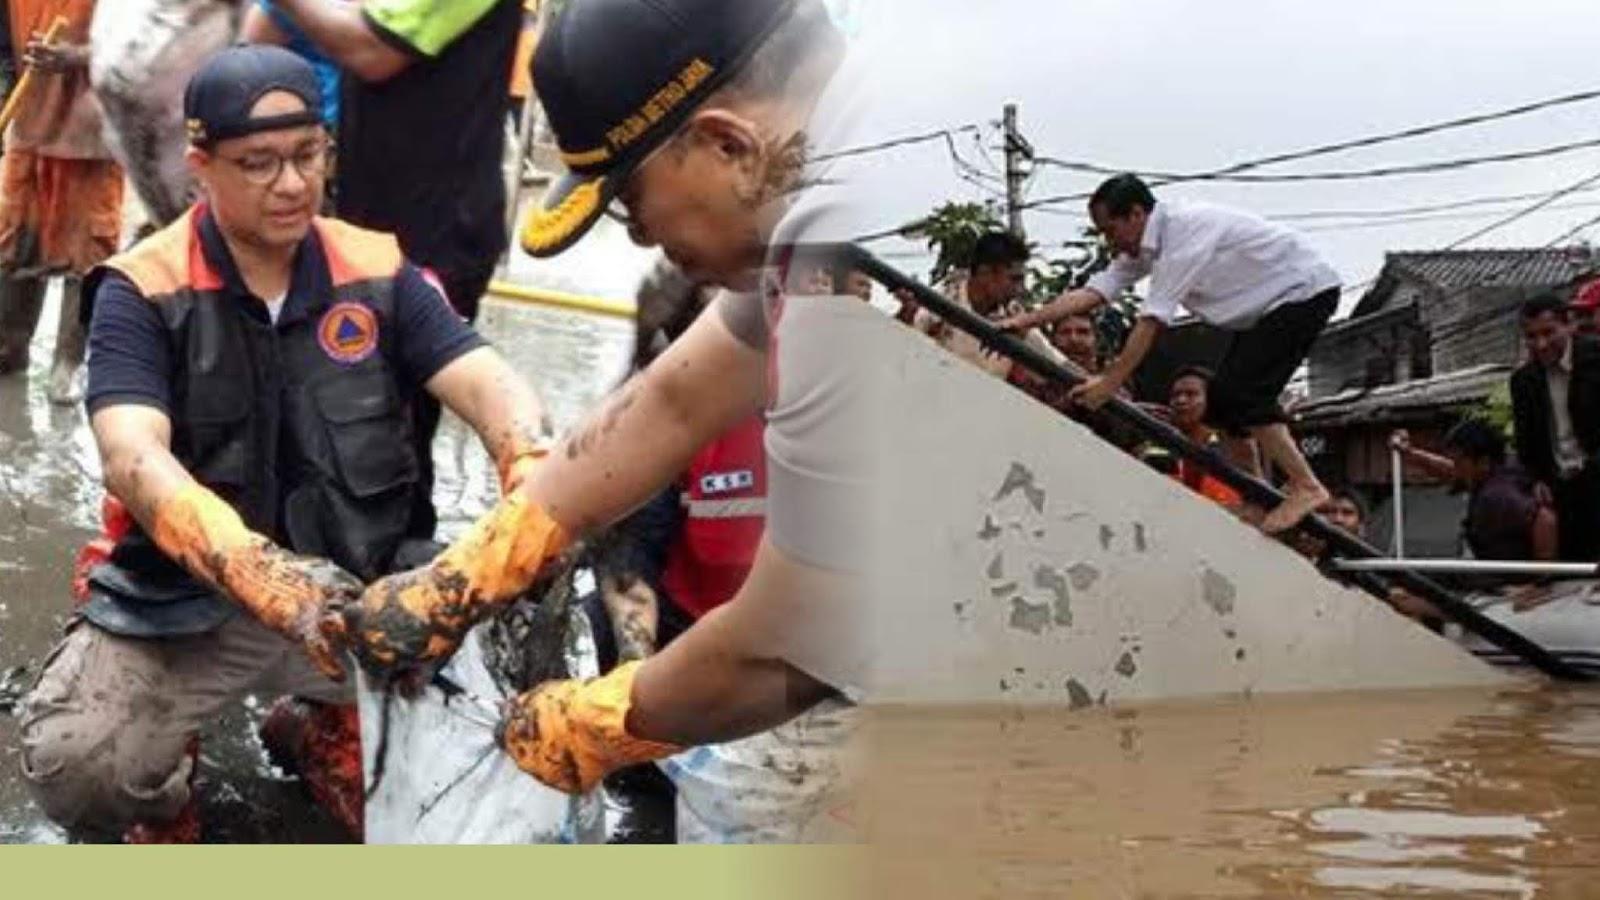 Kata Rocky Gerung, Baru 2020 Anies Sudah Punya Modal Kuat untuk 2024, Kubu Jokowi Belum Punya Jago